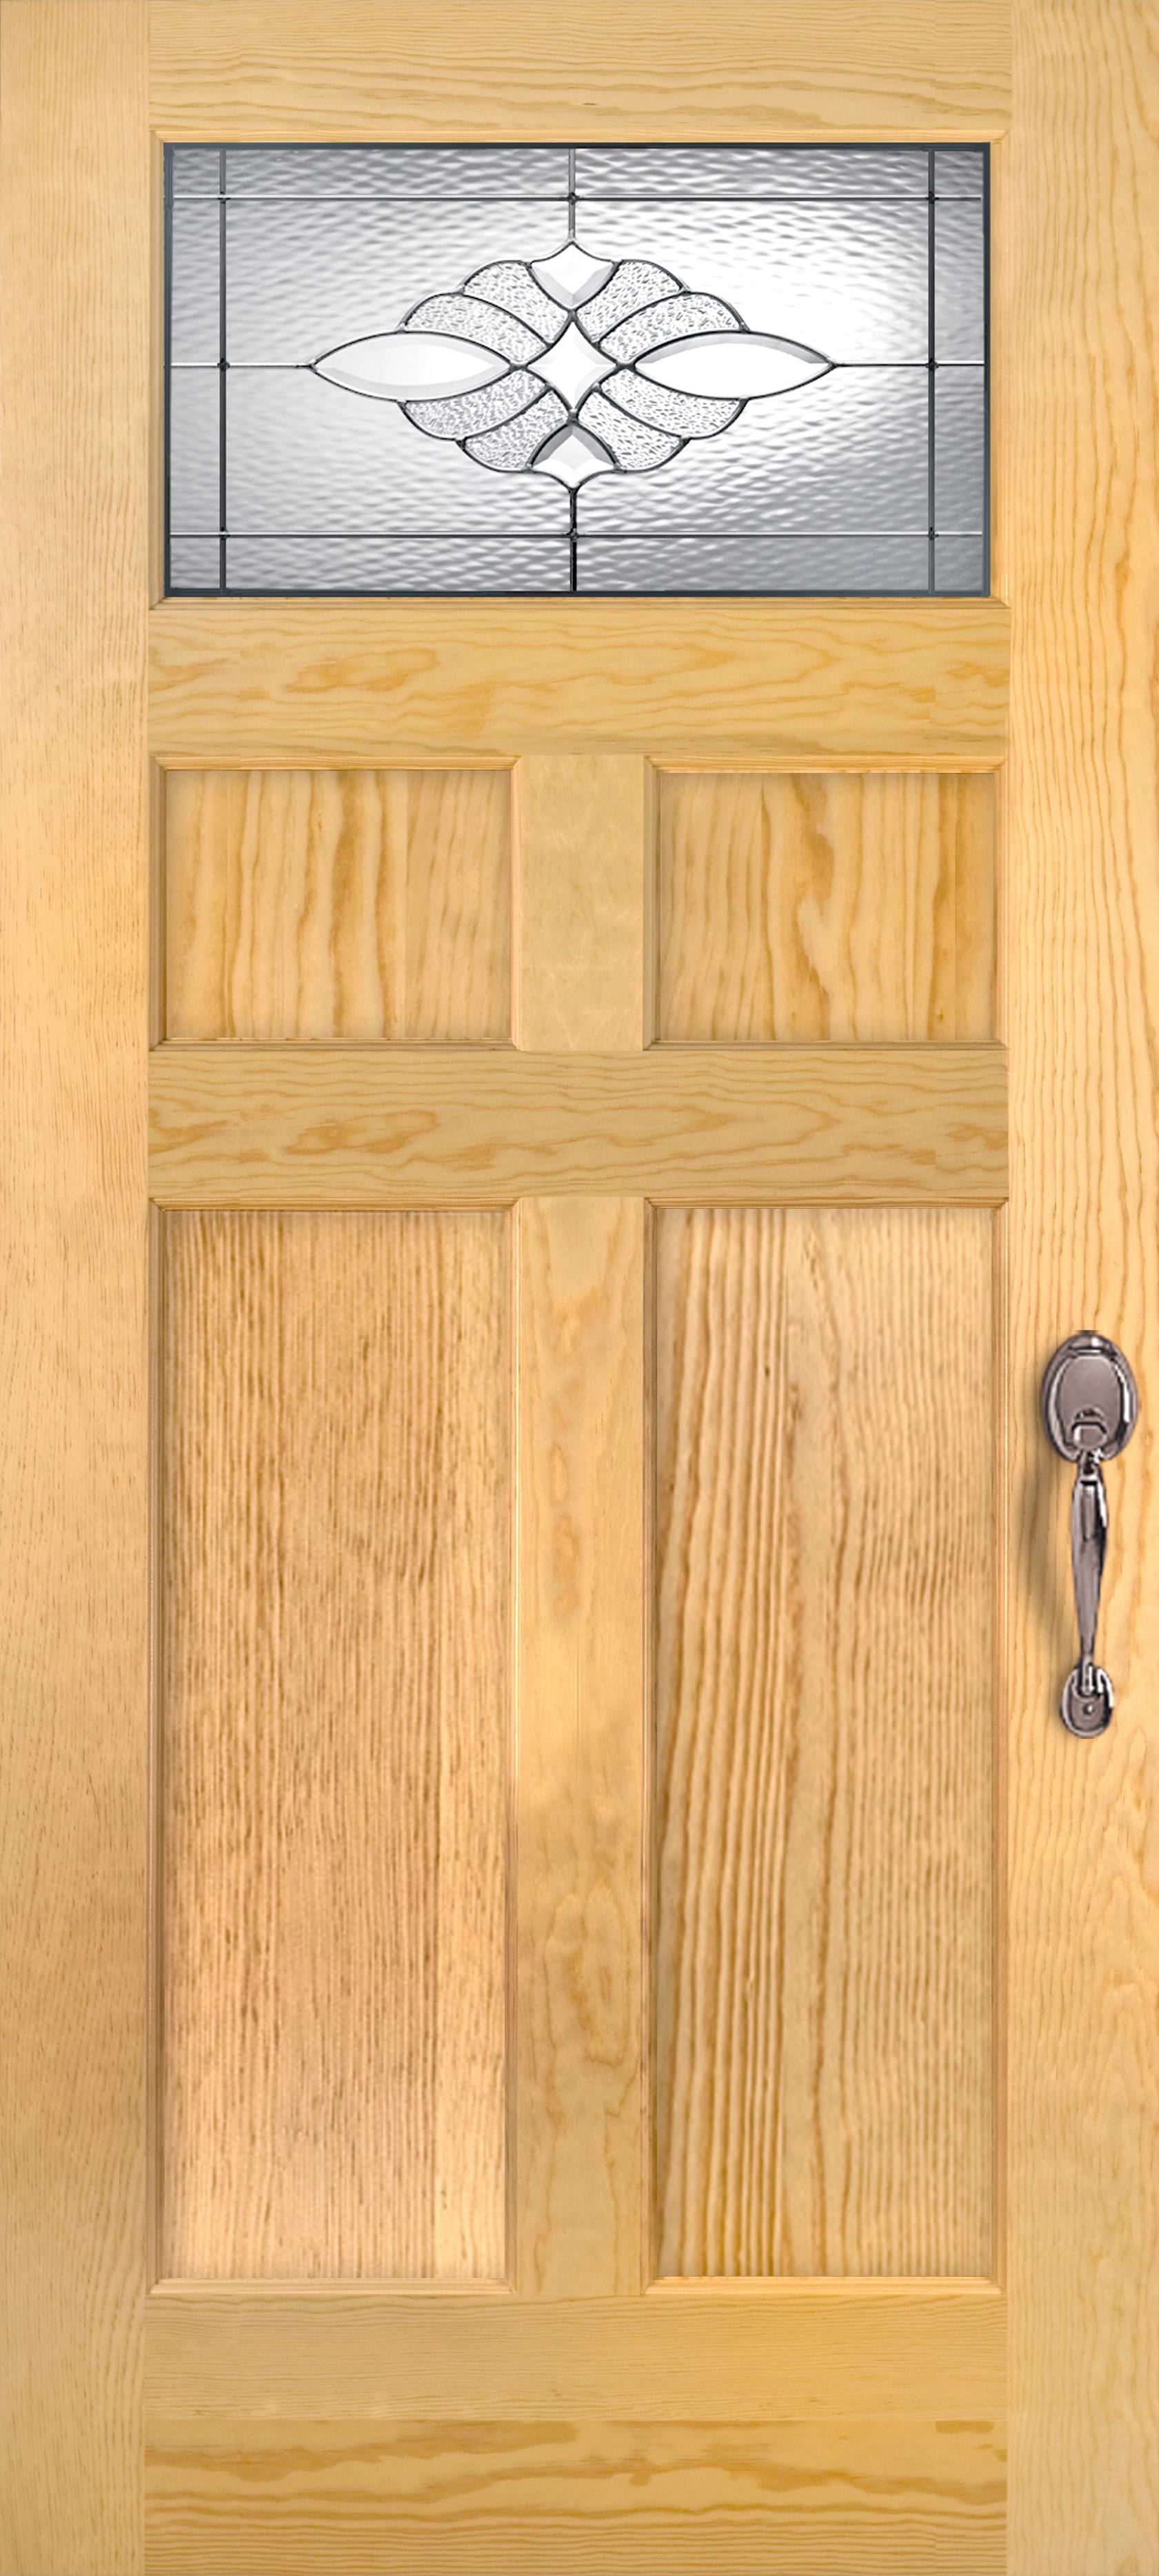 Simpson Door Expands Builder S Advantage Series With